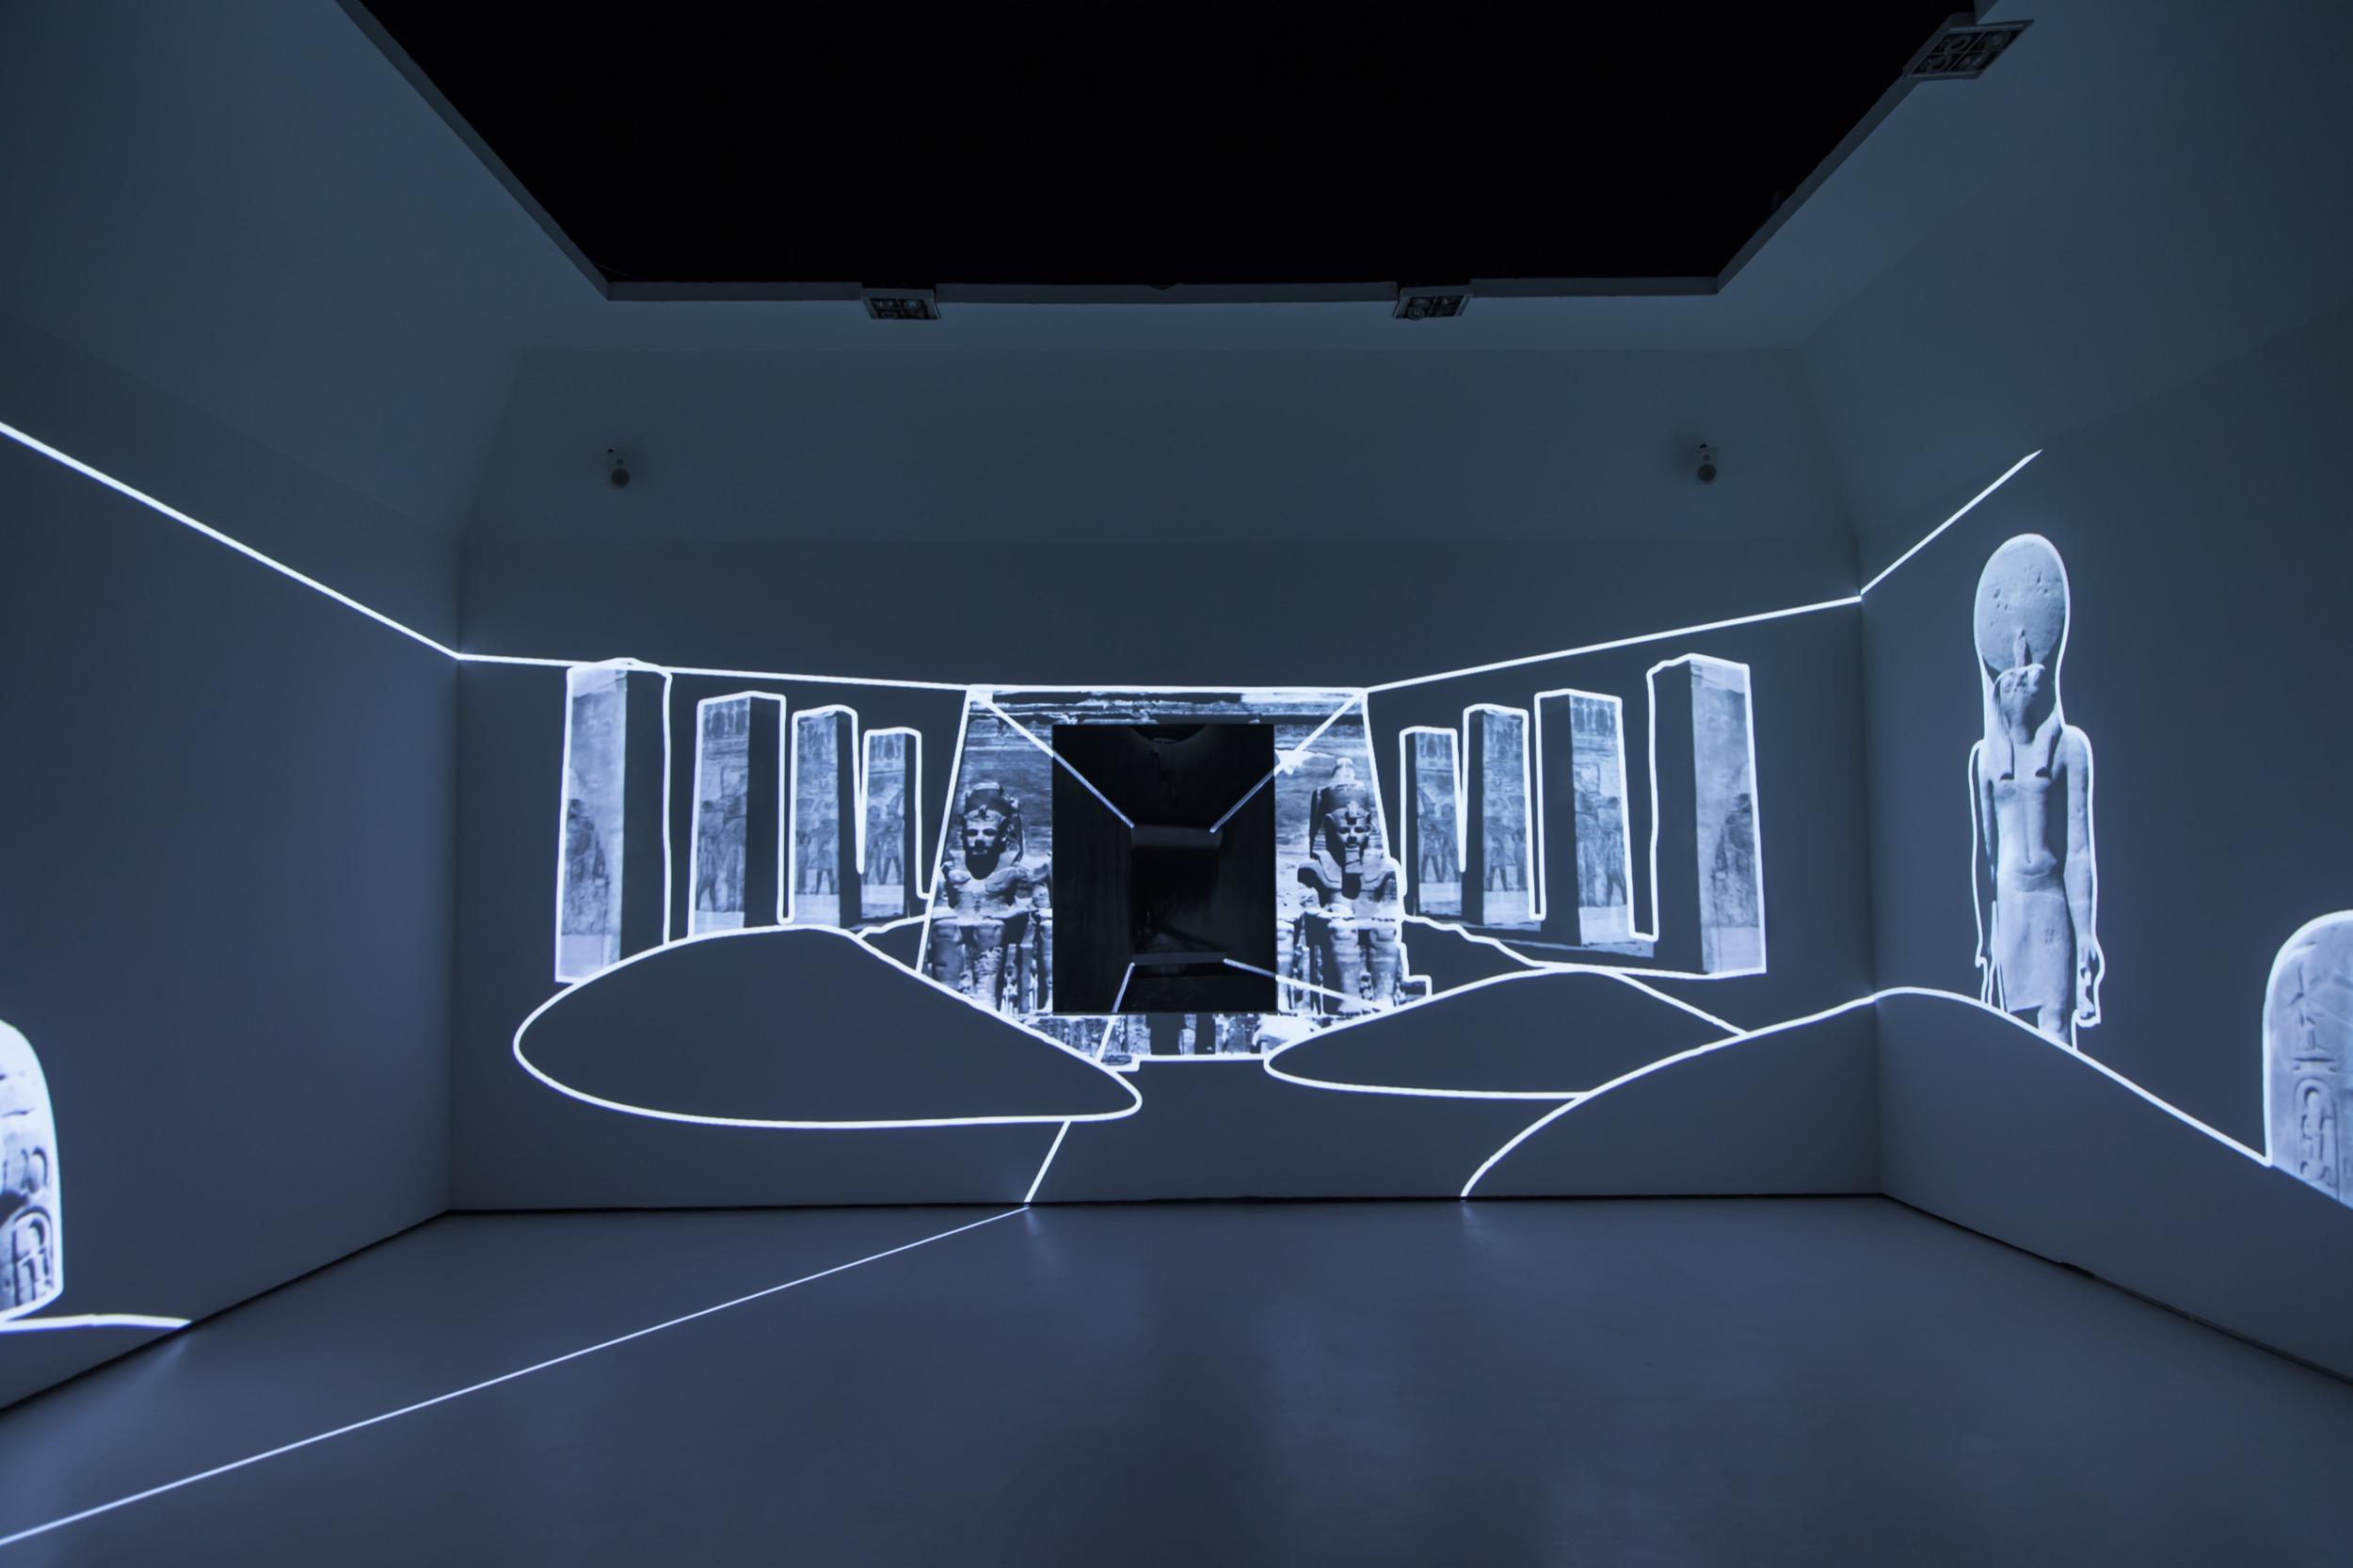 sala 4 Cyclopica Triennale di Milano